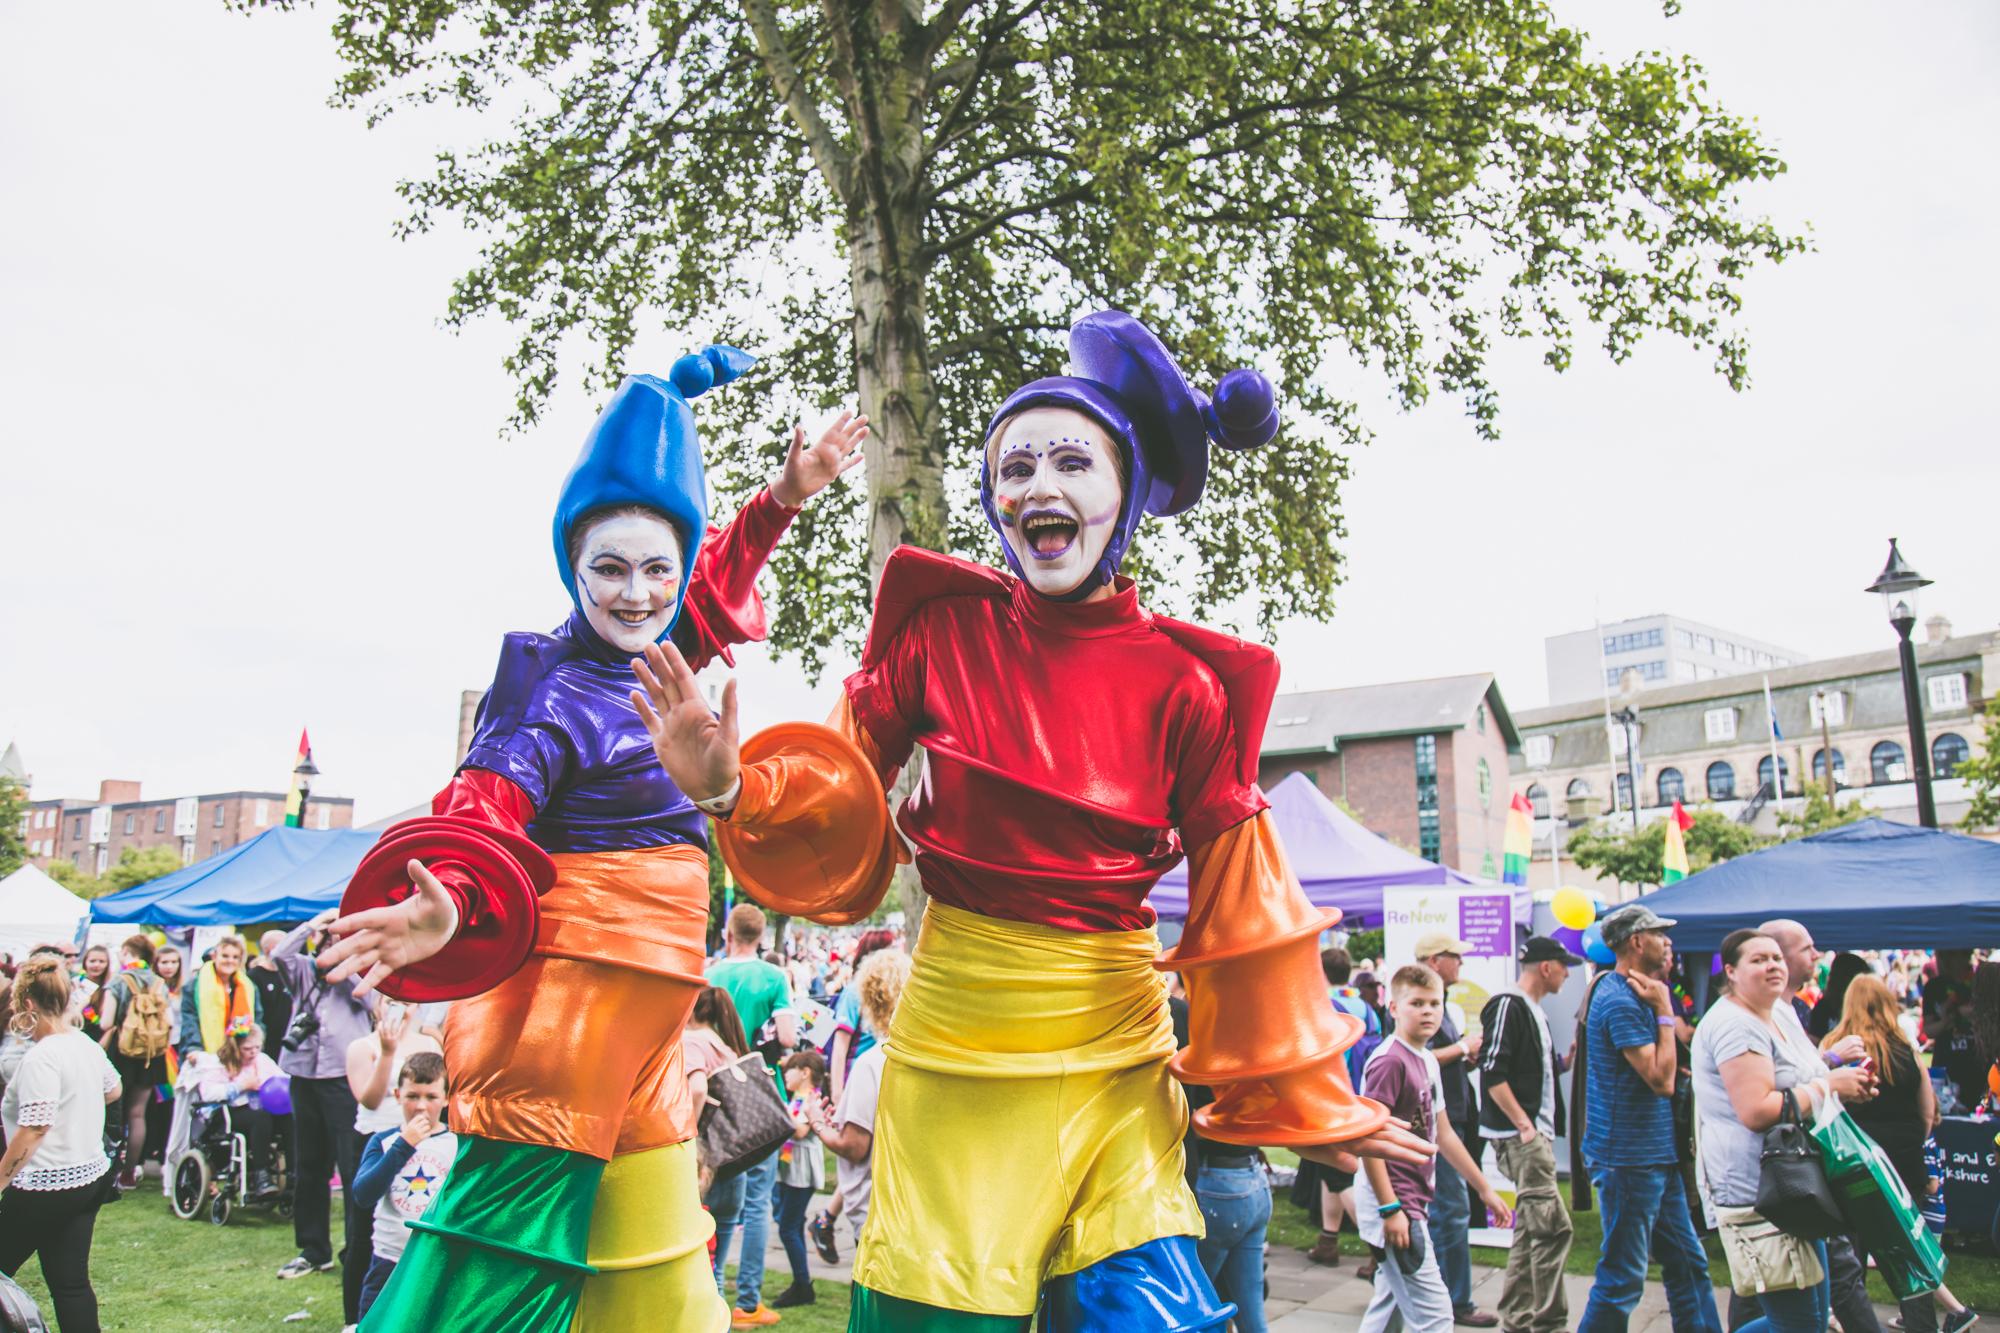 Rainbow Stilt walkers of Upperlevel